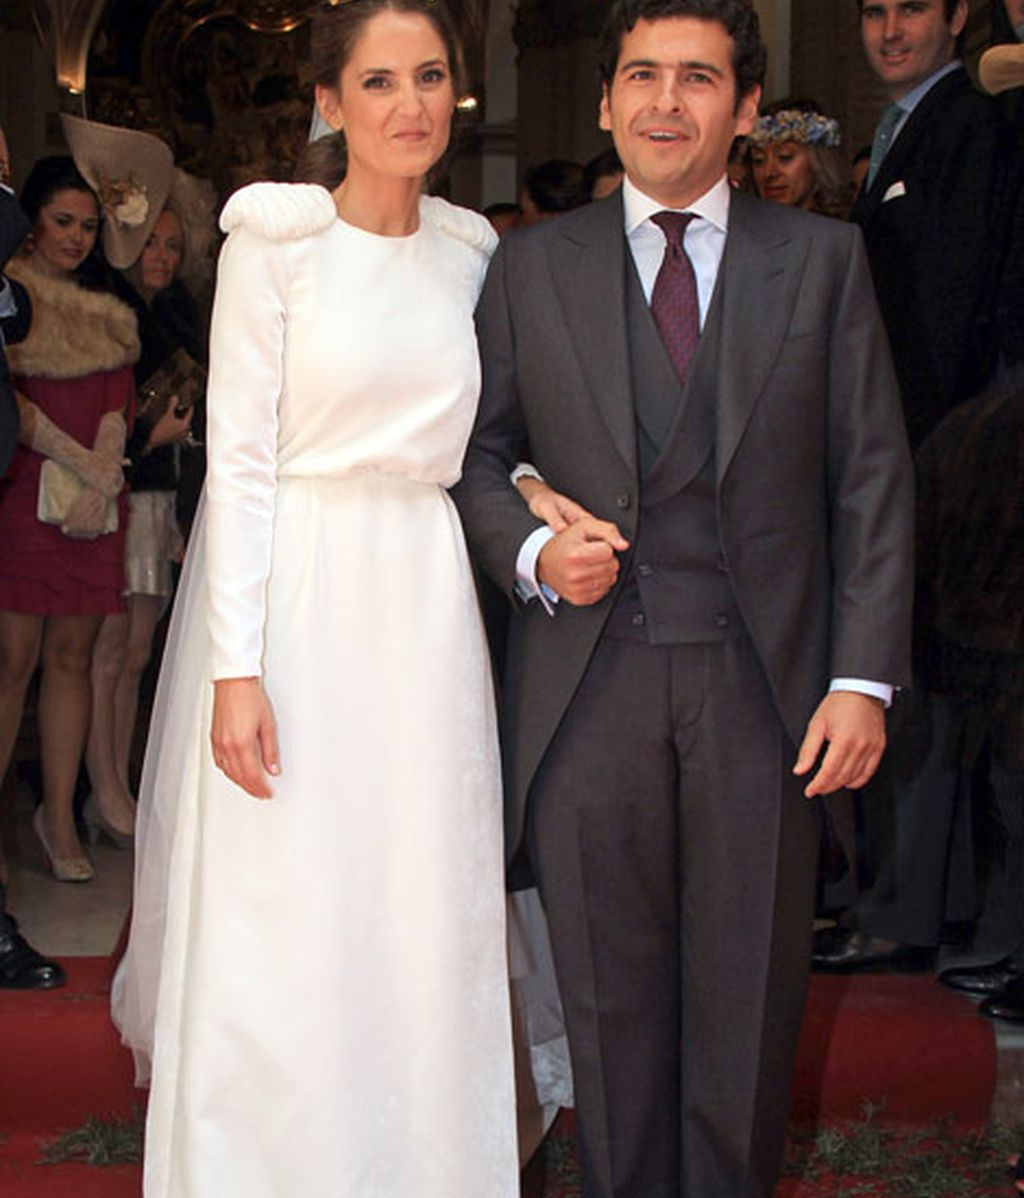 Juan Ignacio Zoido y Arantxa Díaz, a la salida de la iglesia